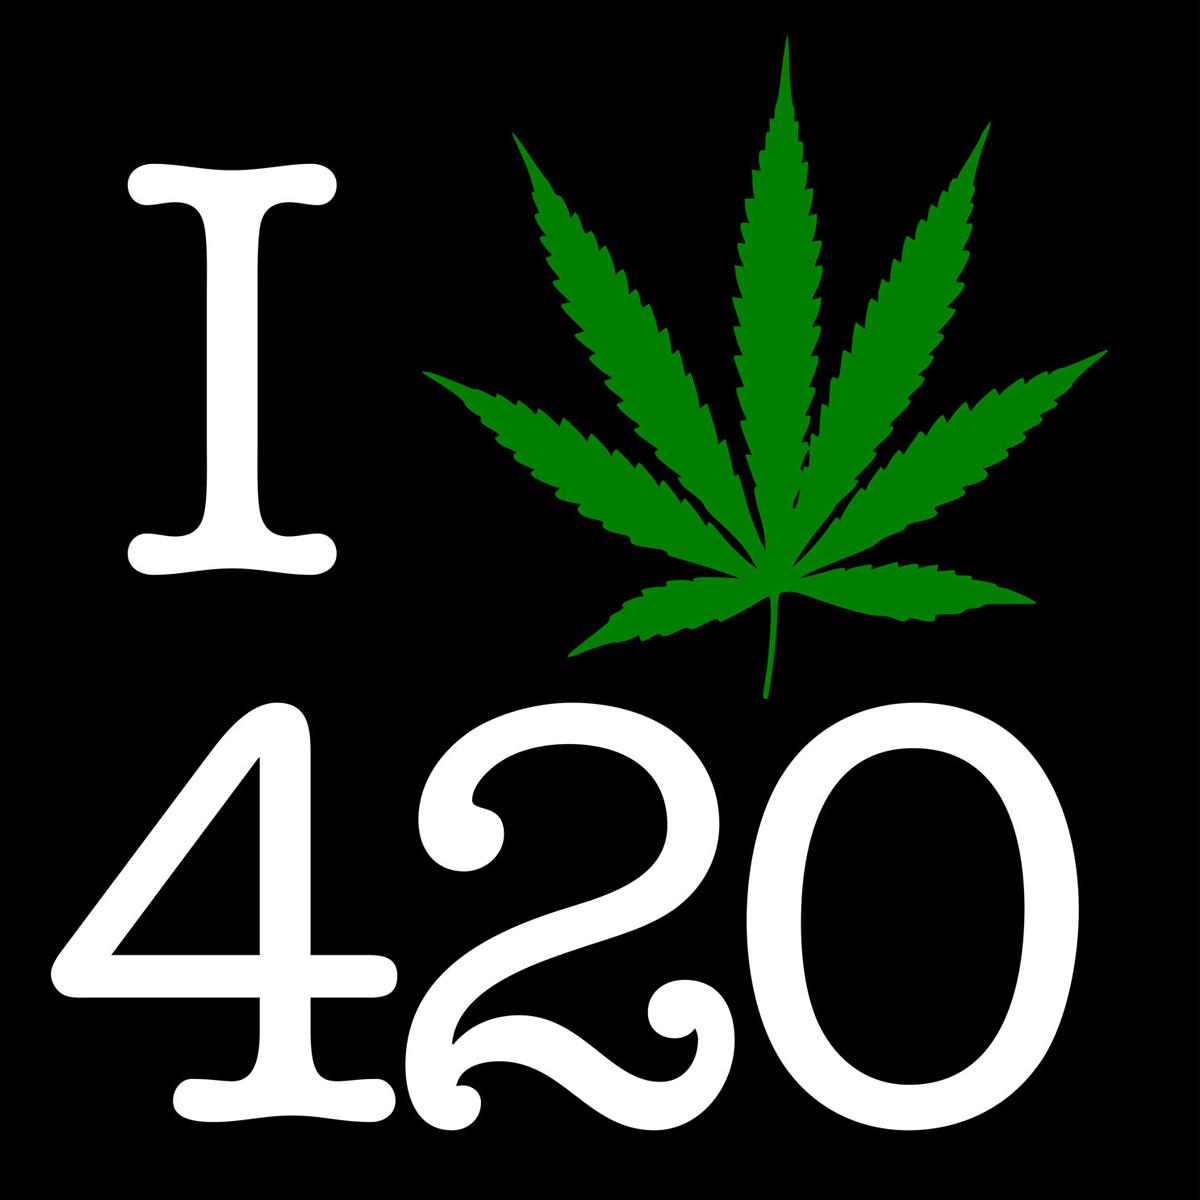 I Love 420 Pot Leaf Black T Shirt Men S Rastaempire Com